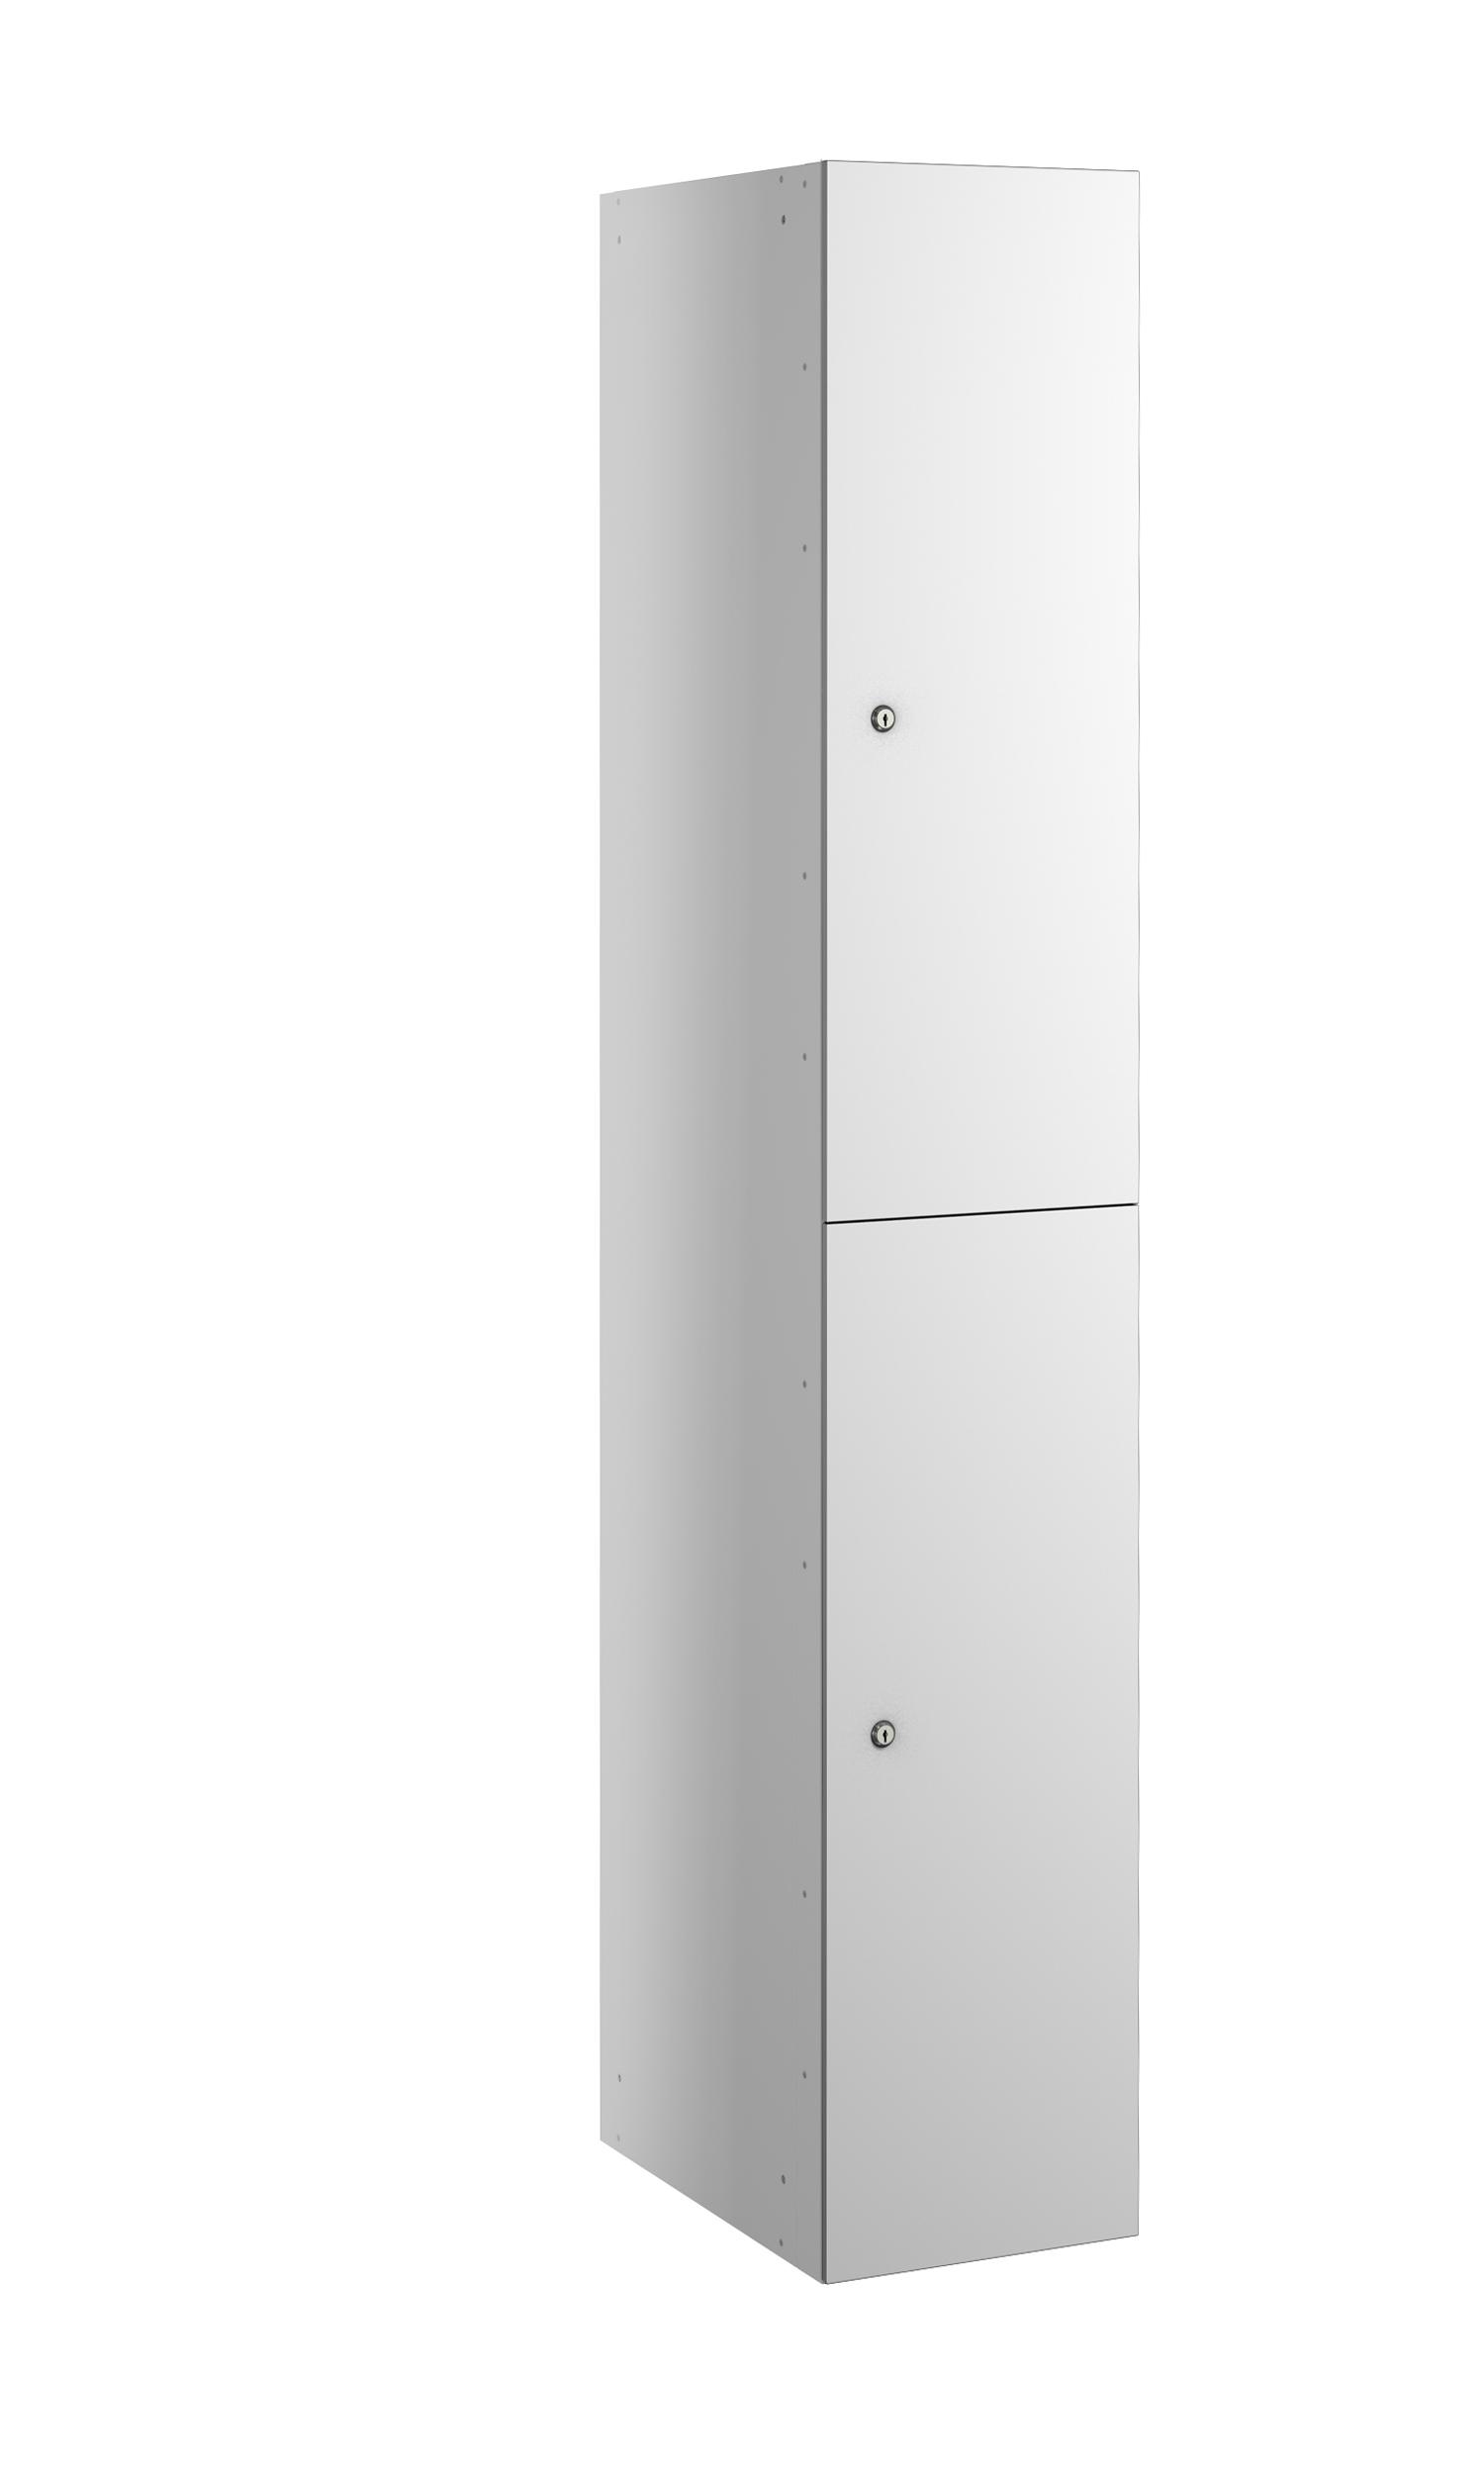 Probe buzzbox laminate 2 doors white